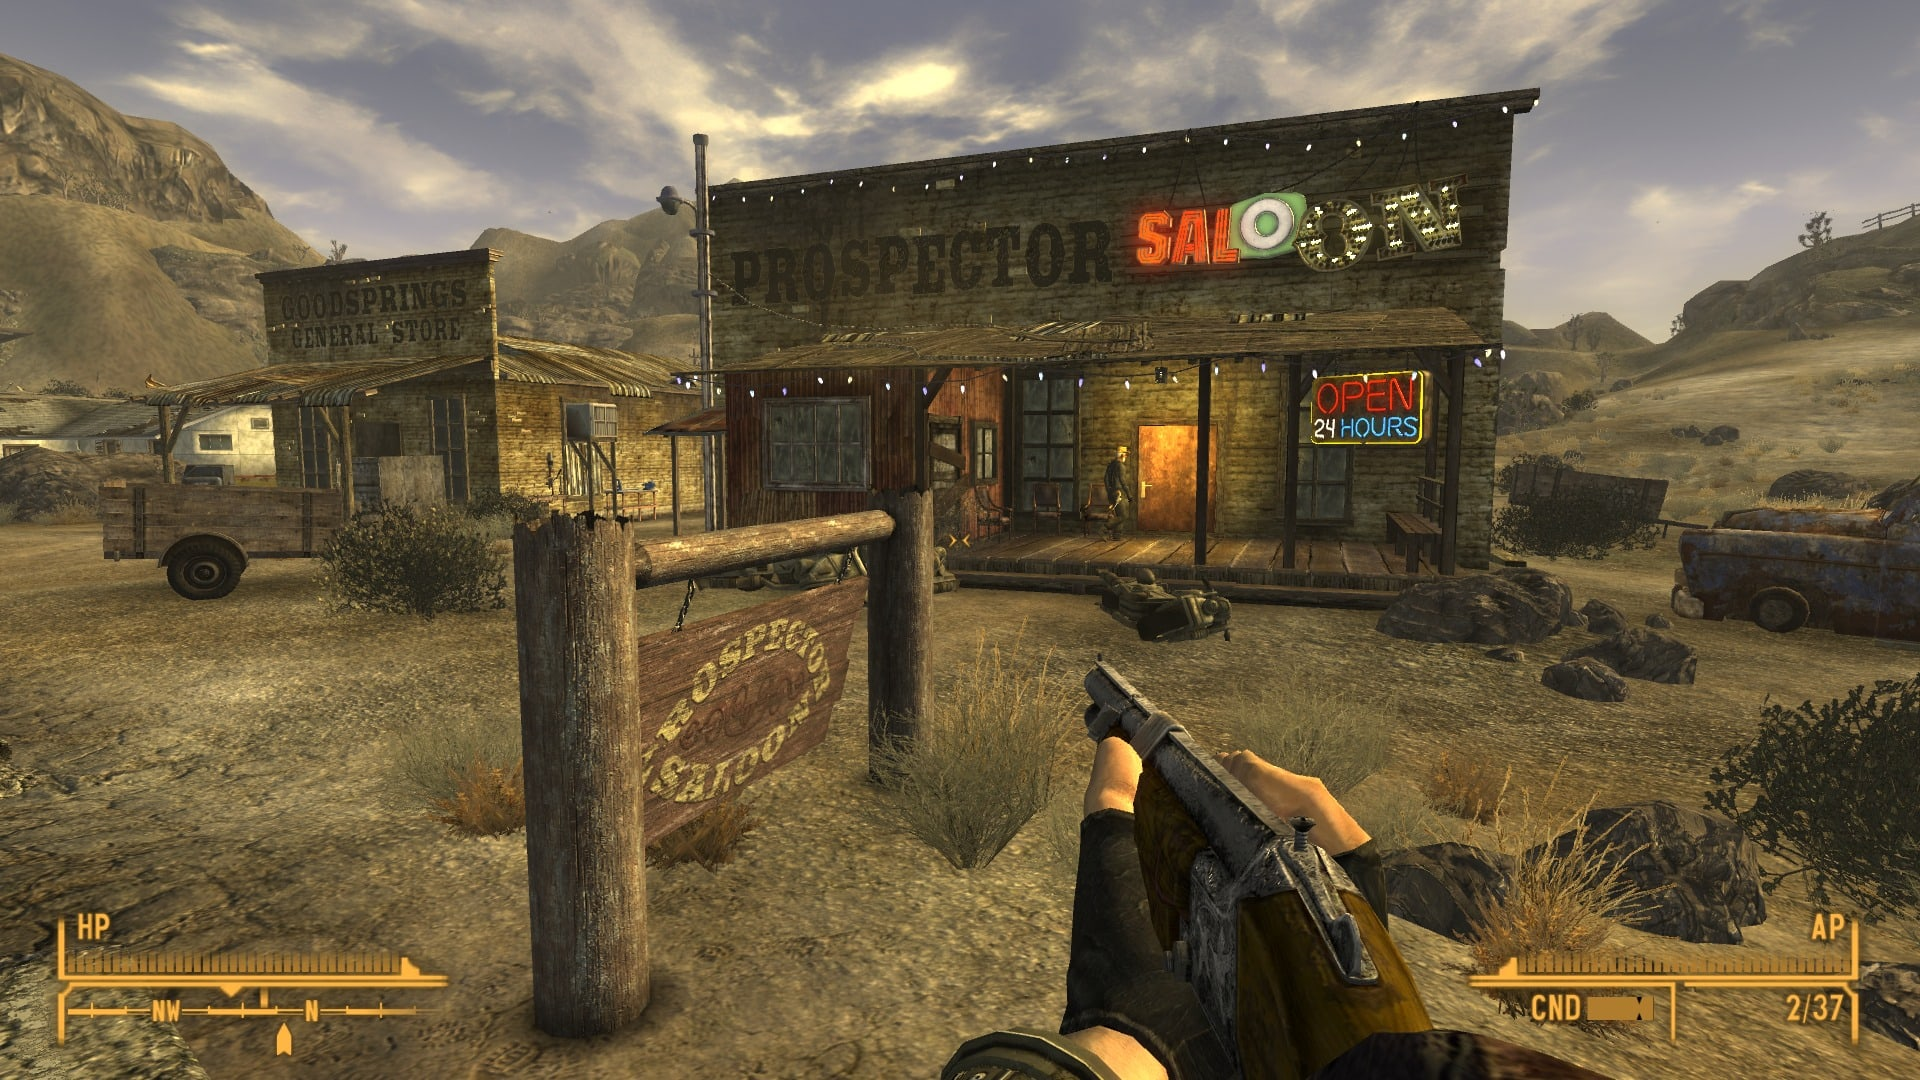 Xbox Game Pass gry najlepsza fabuła - Fallout: New Vegas